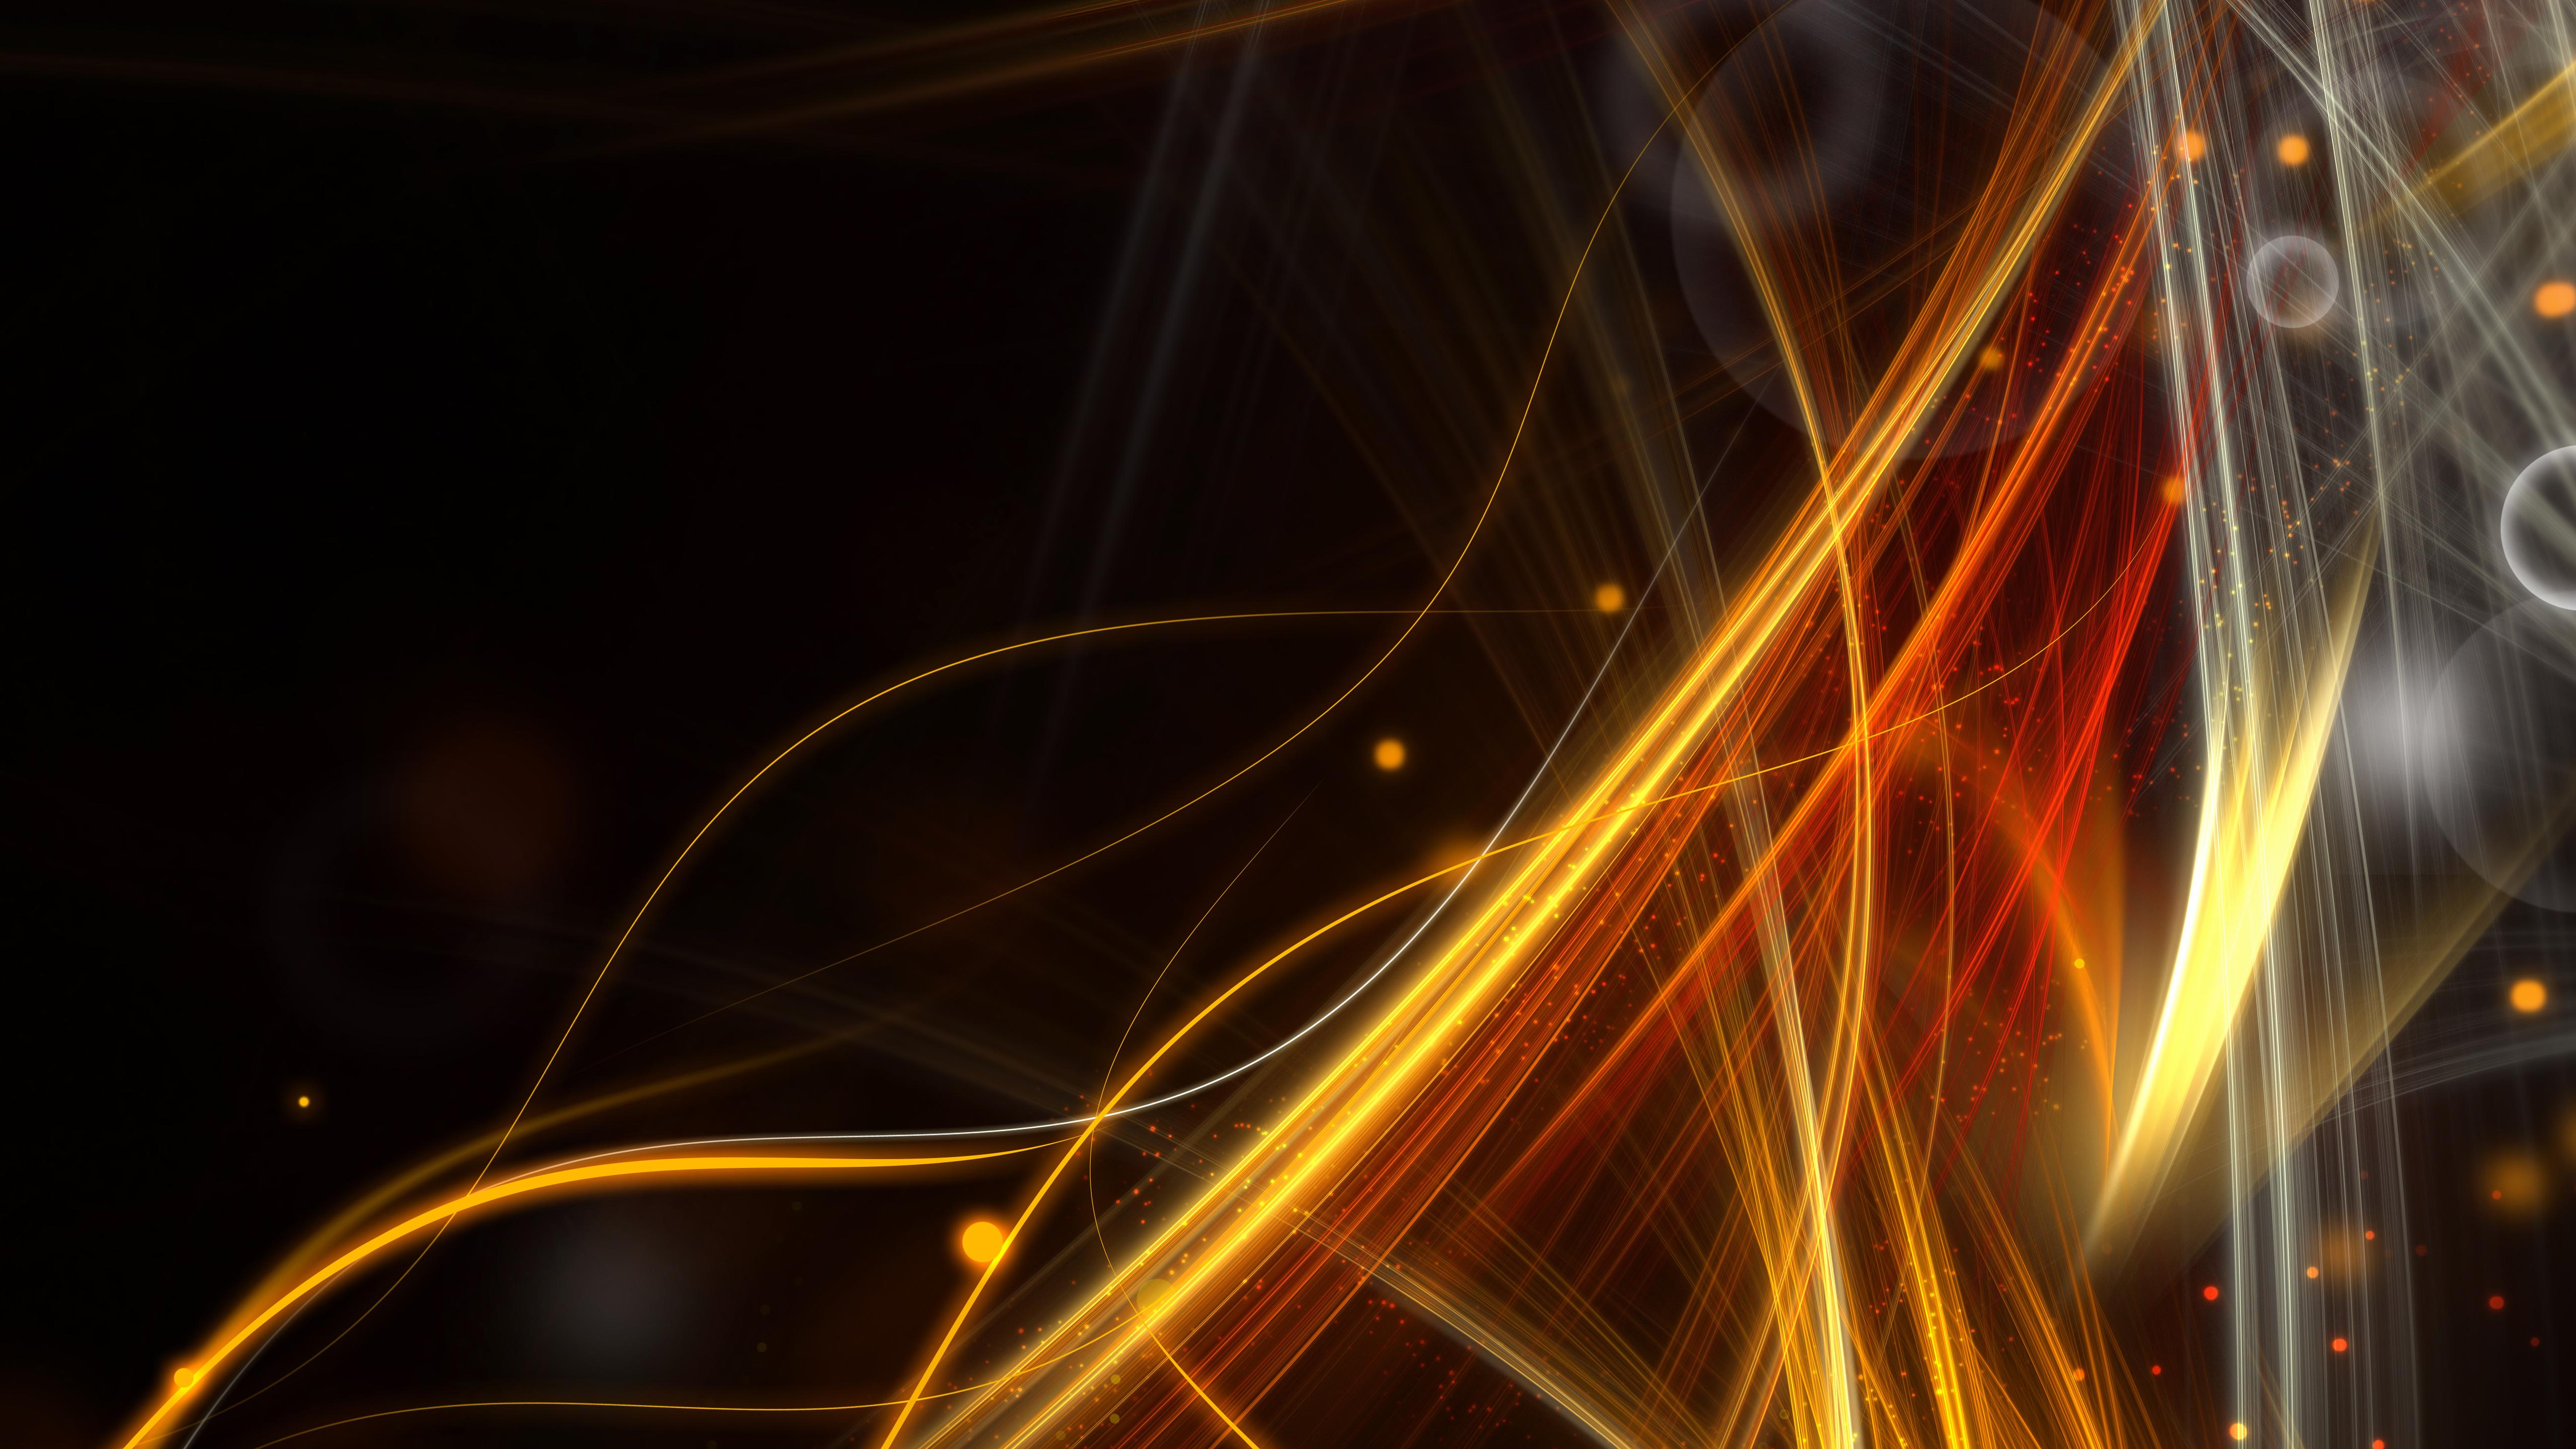 fire abstract 4k 1602439015 - Fire Abstract 4k - Fire Abstract 4k wallpapers